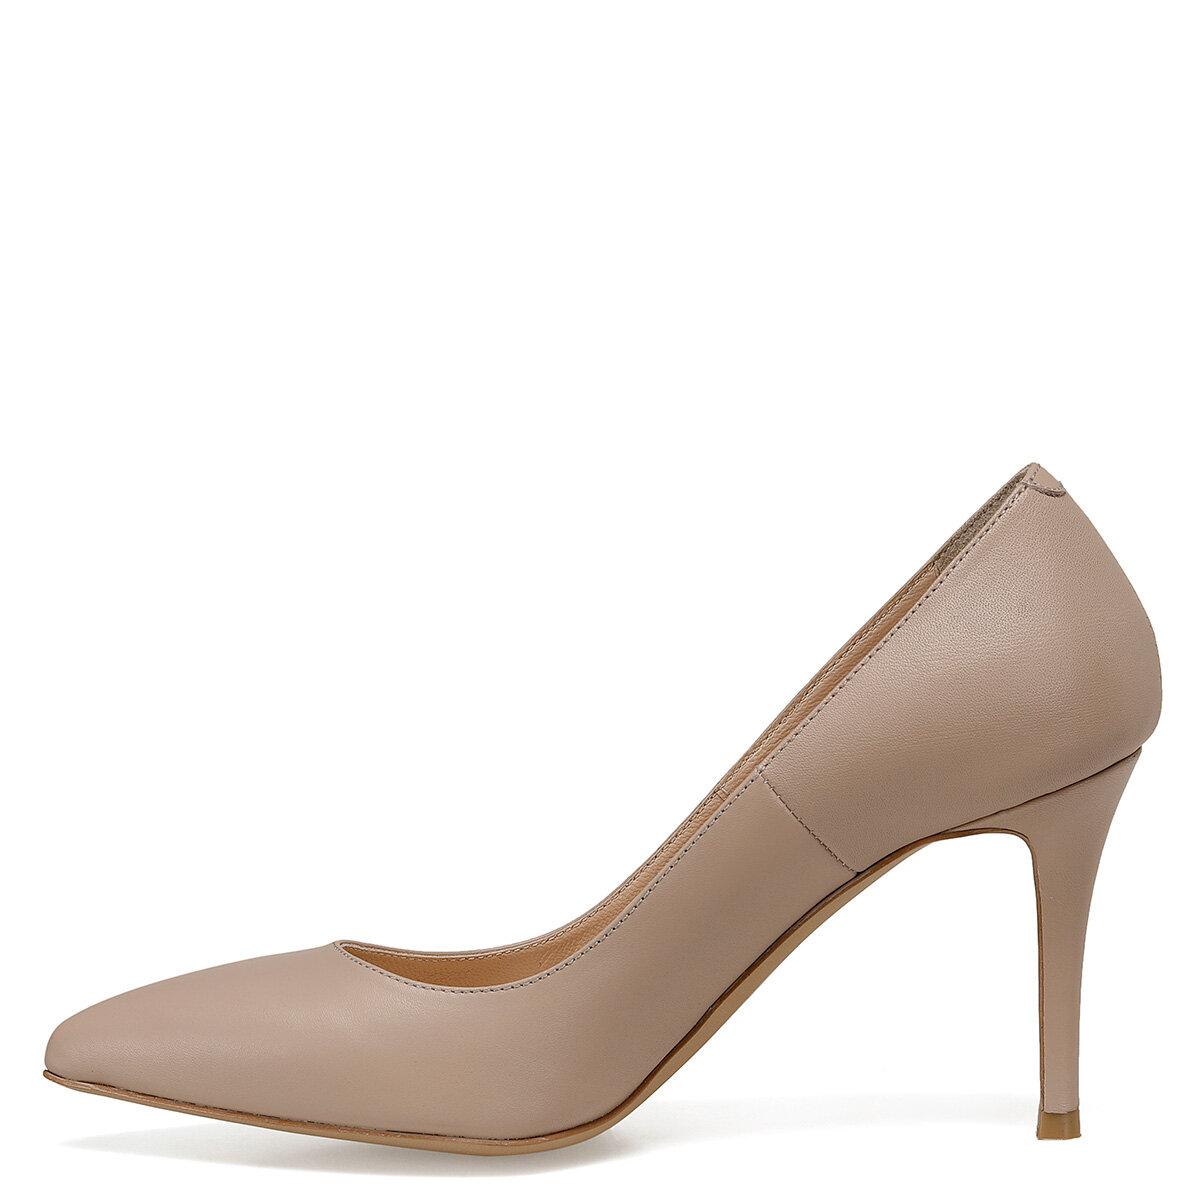 JACKIE Naturel Kadın Topuklu Ayakkabı